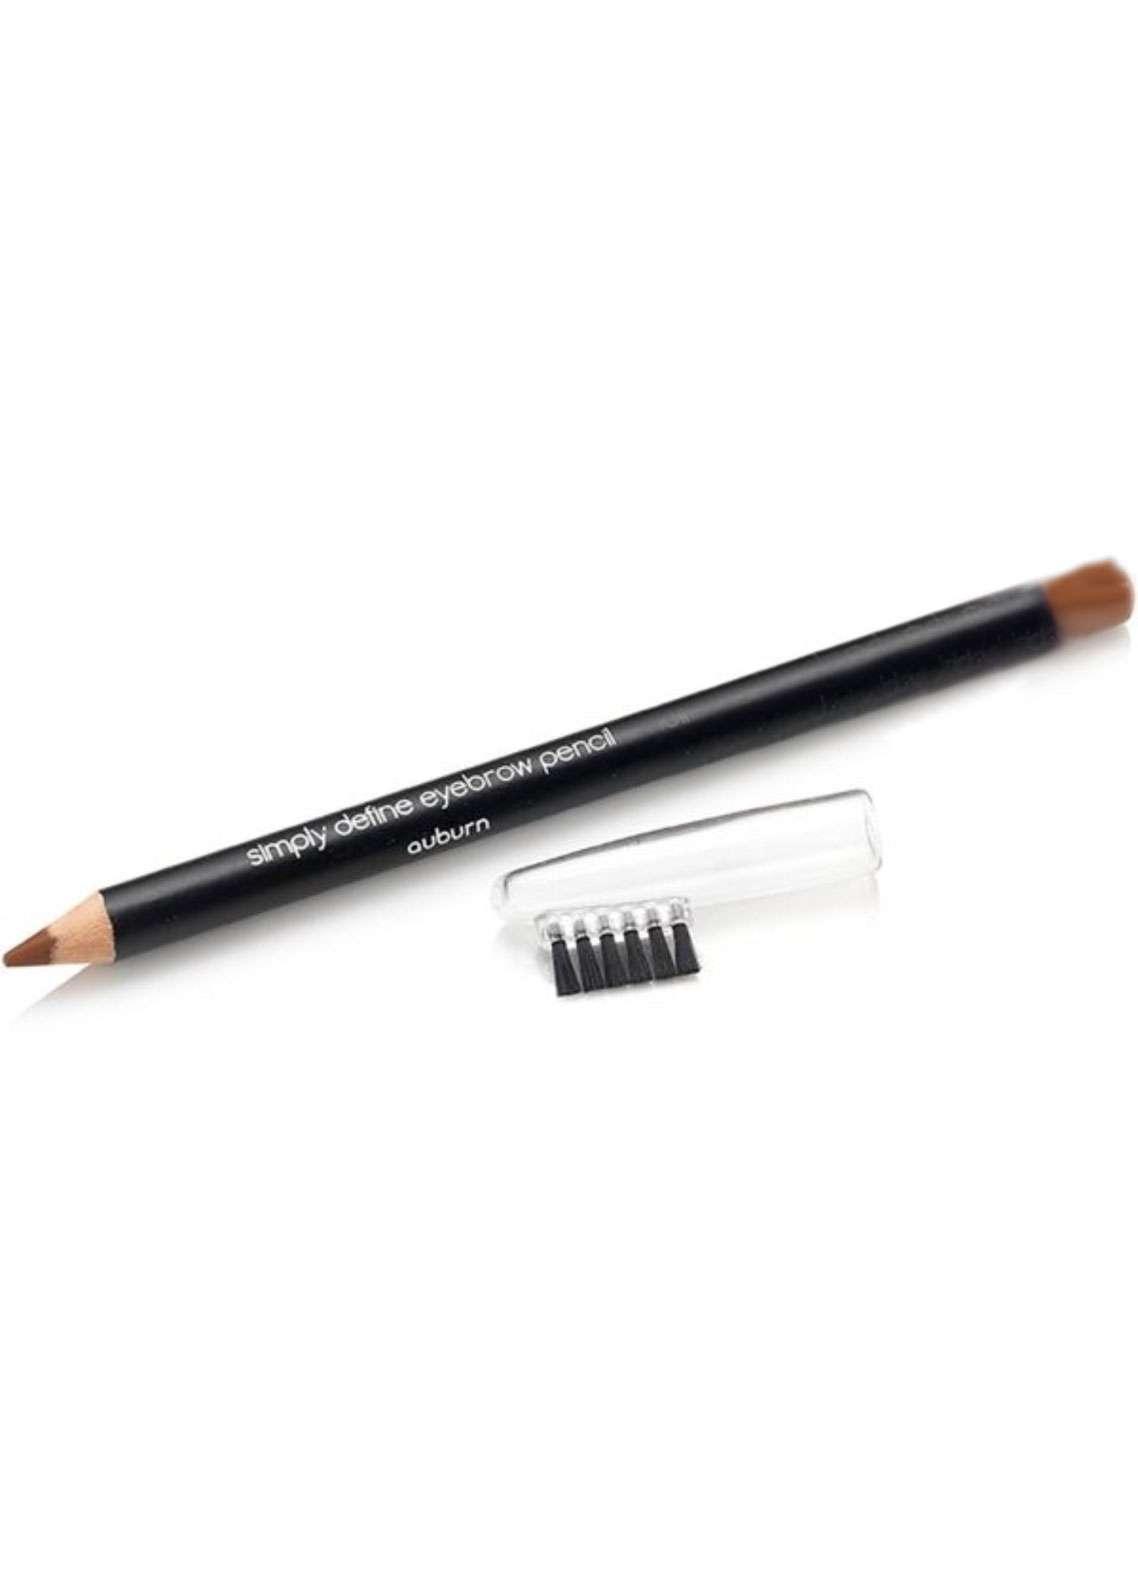 Beauty UK Eye Brow Pencil - 03 Auburn